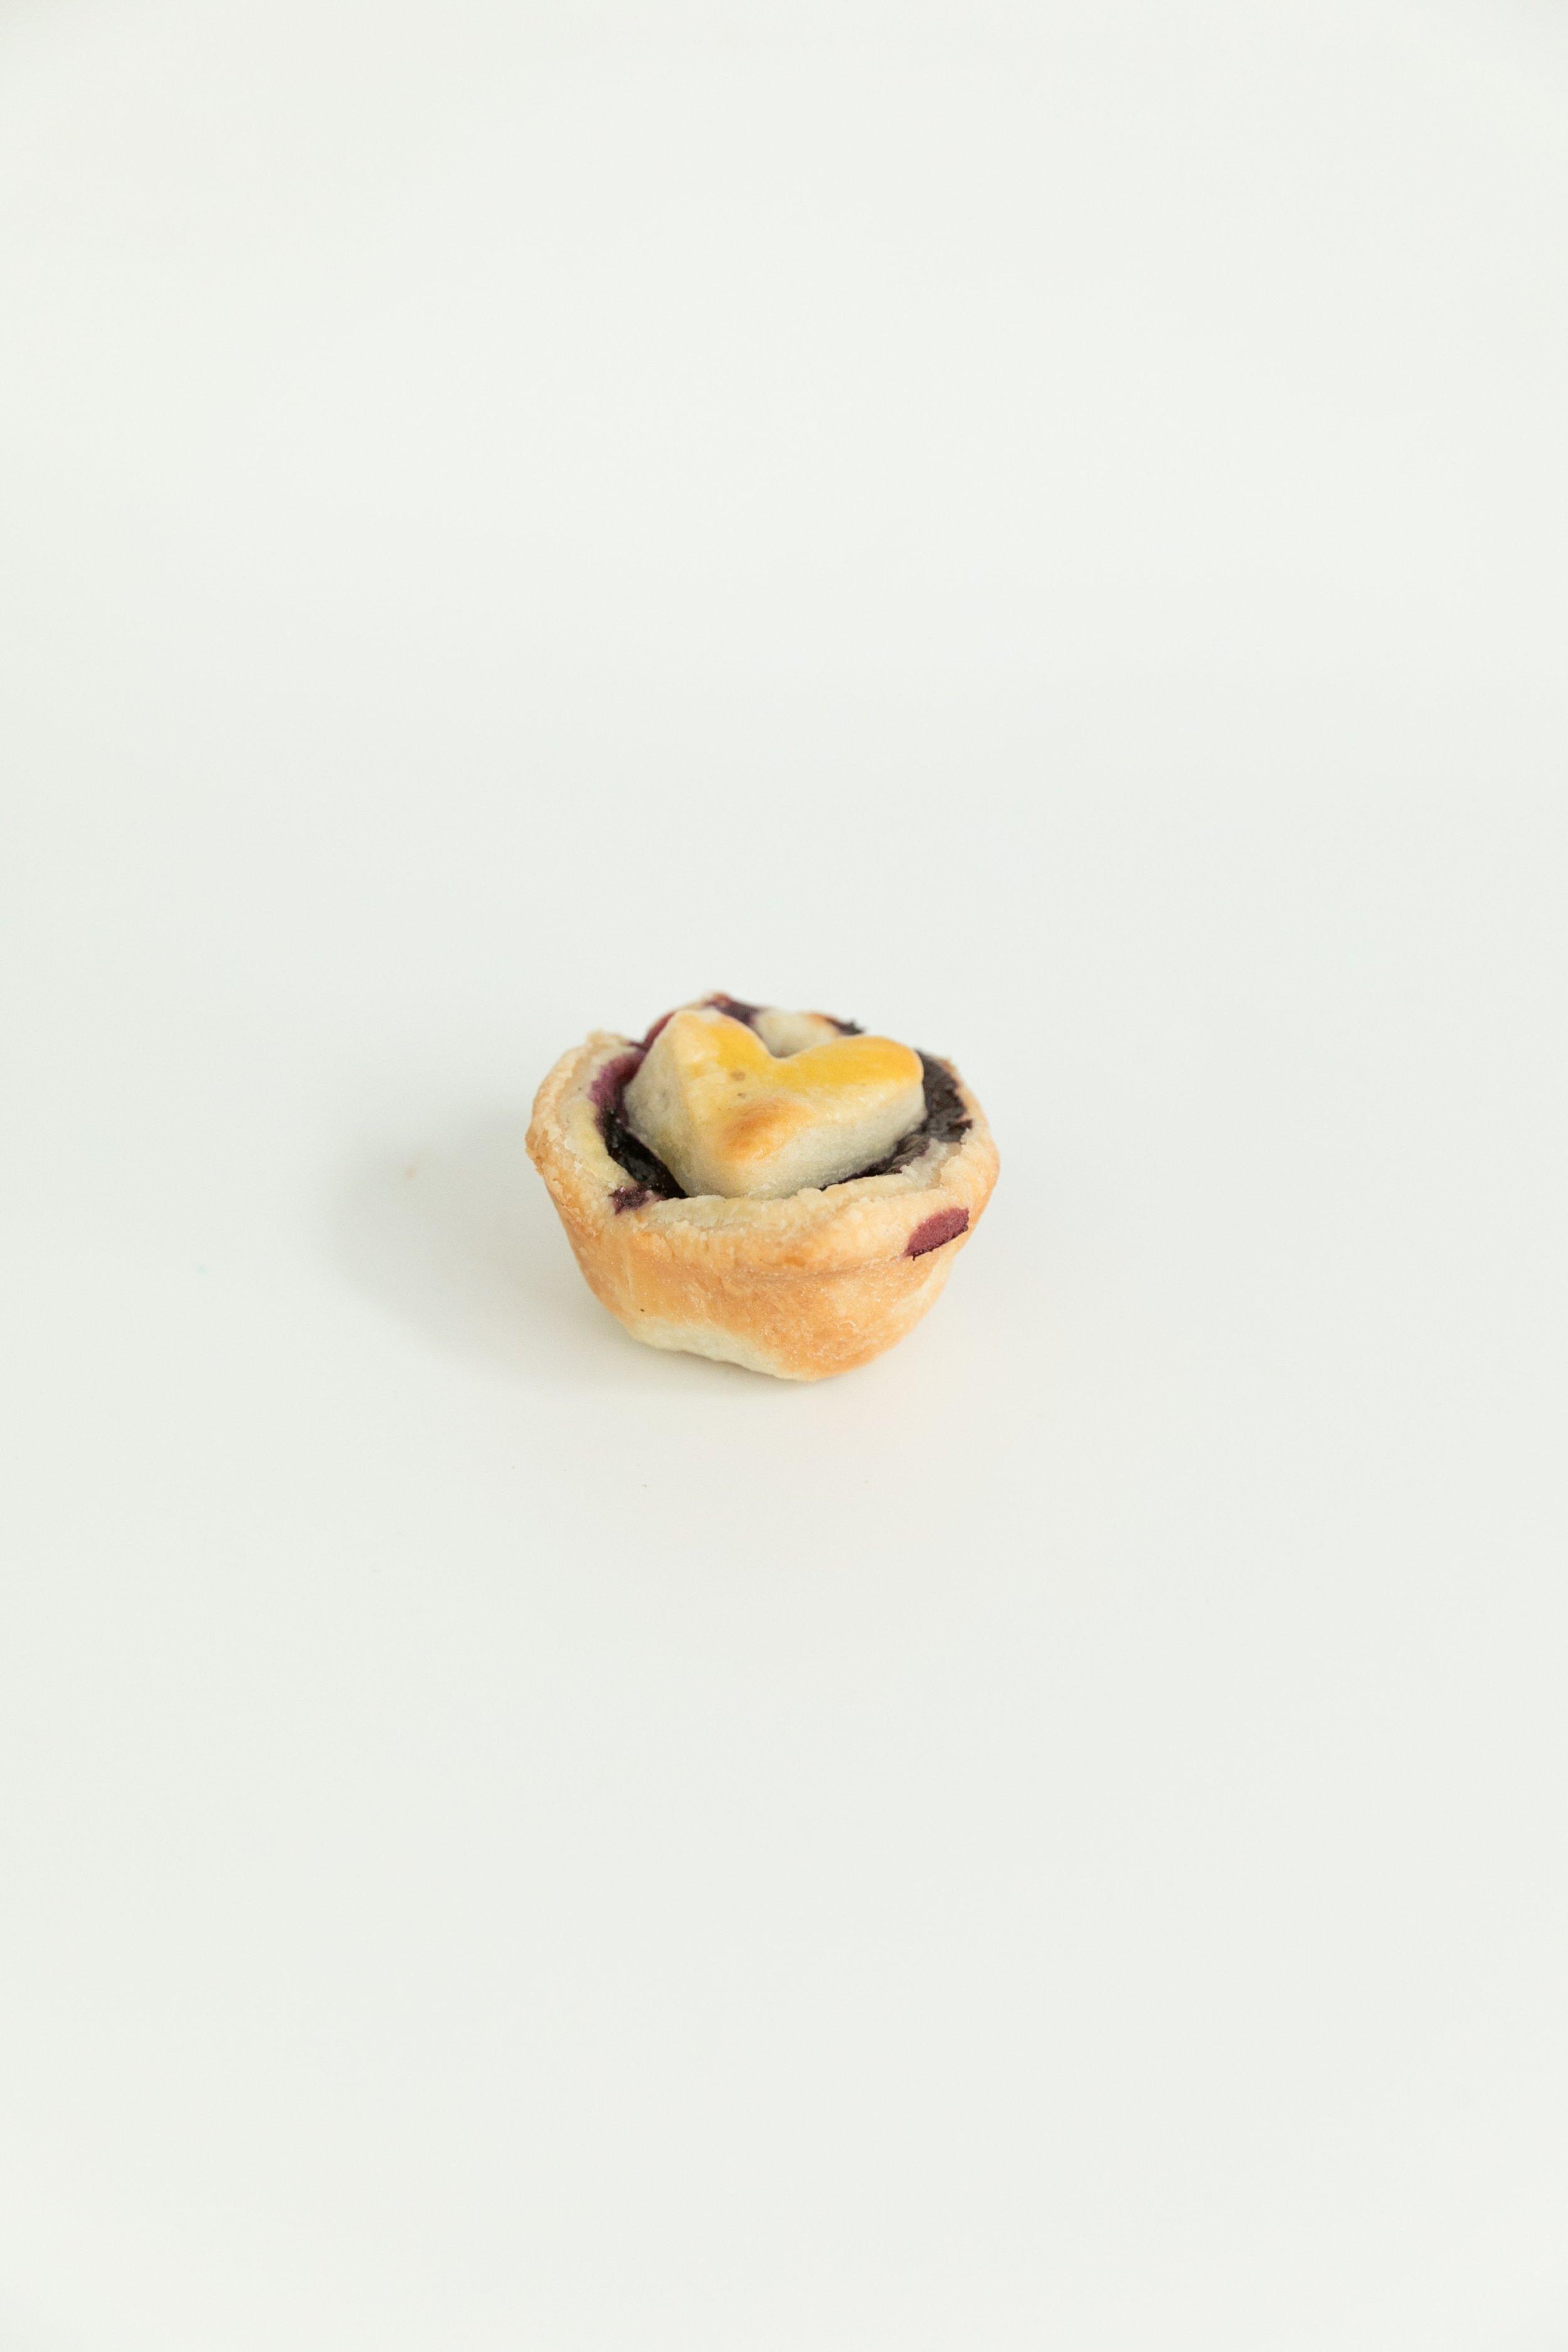 mini mini blueberry pie with heart top